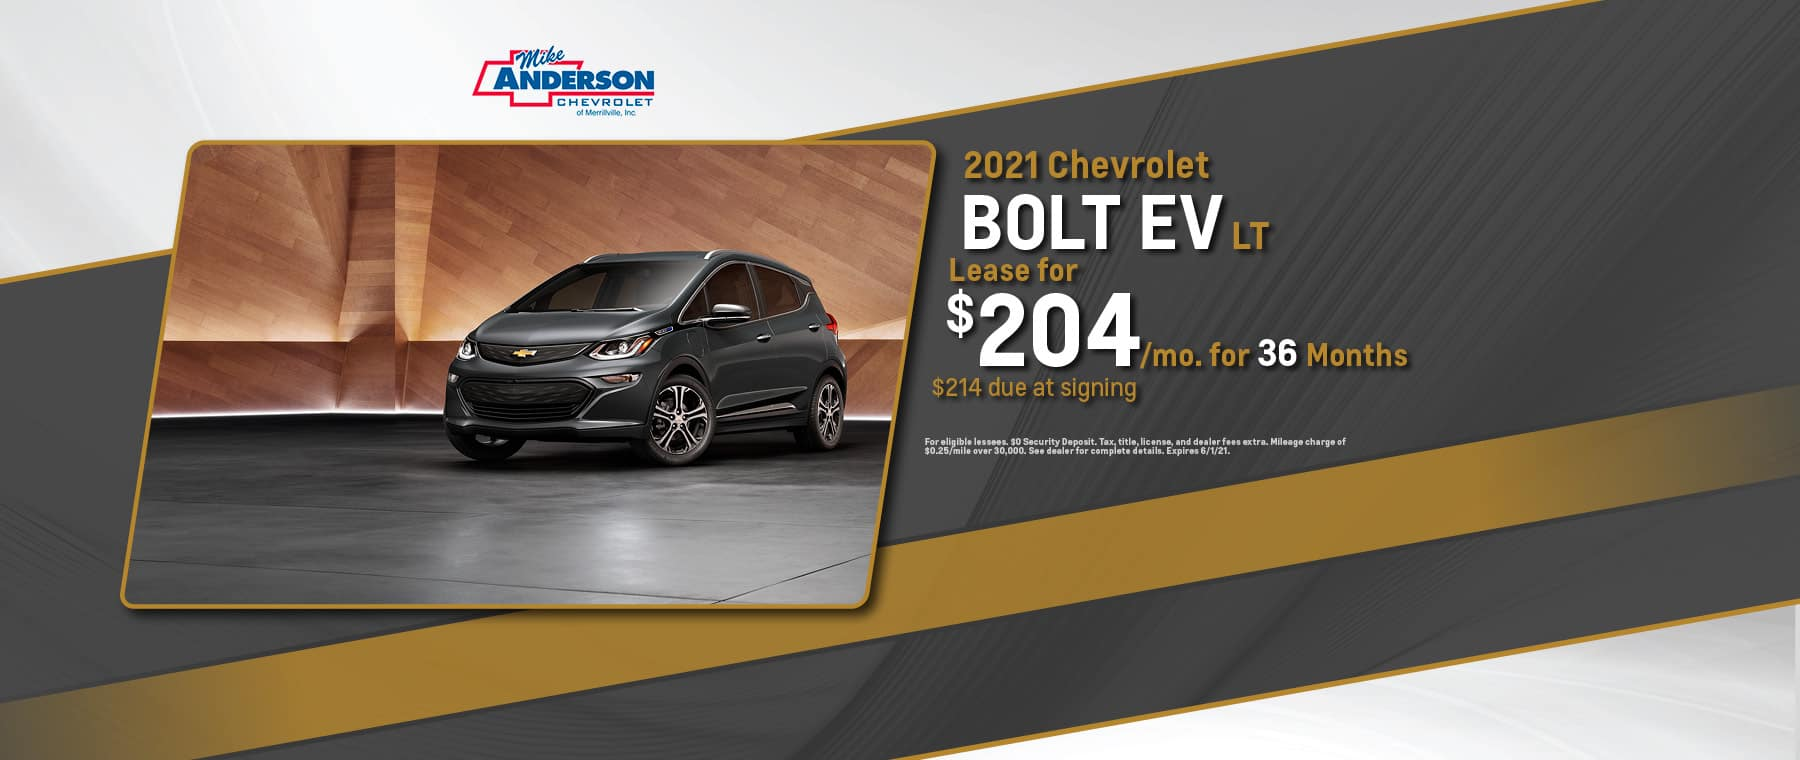 2021-05-mikeandersonchevmerroffplat-10293659-21BoltEVLT-lease-OT